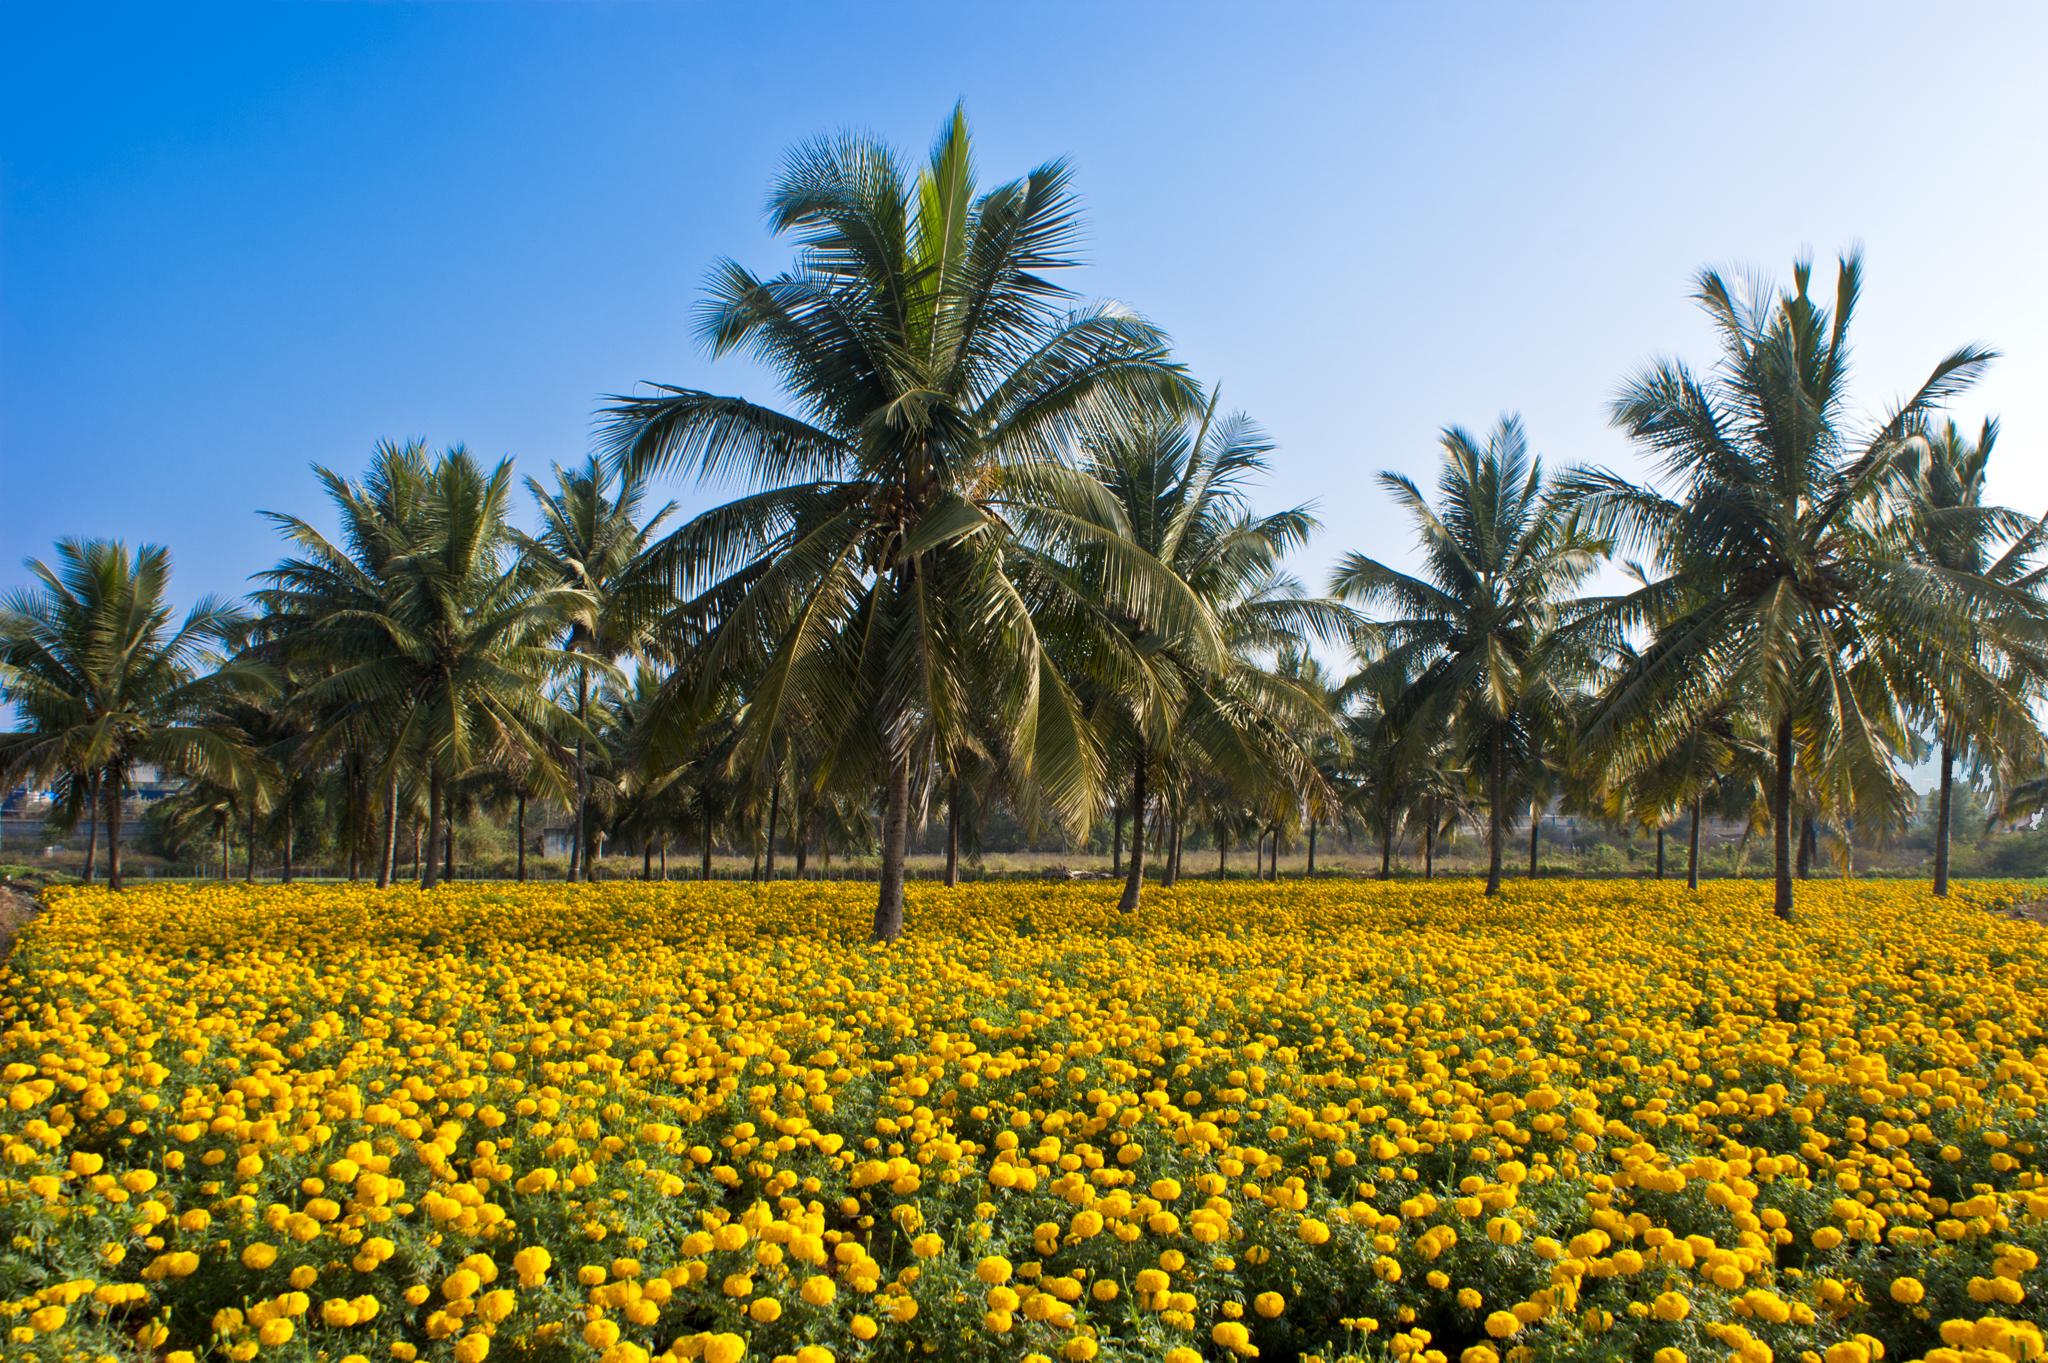 Earth's Biodiversity Benefits All Life